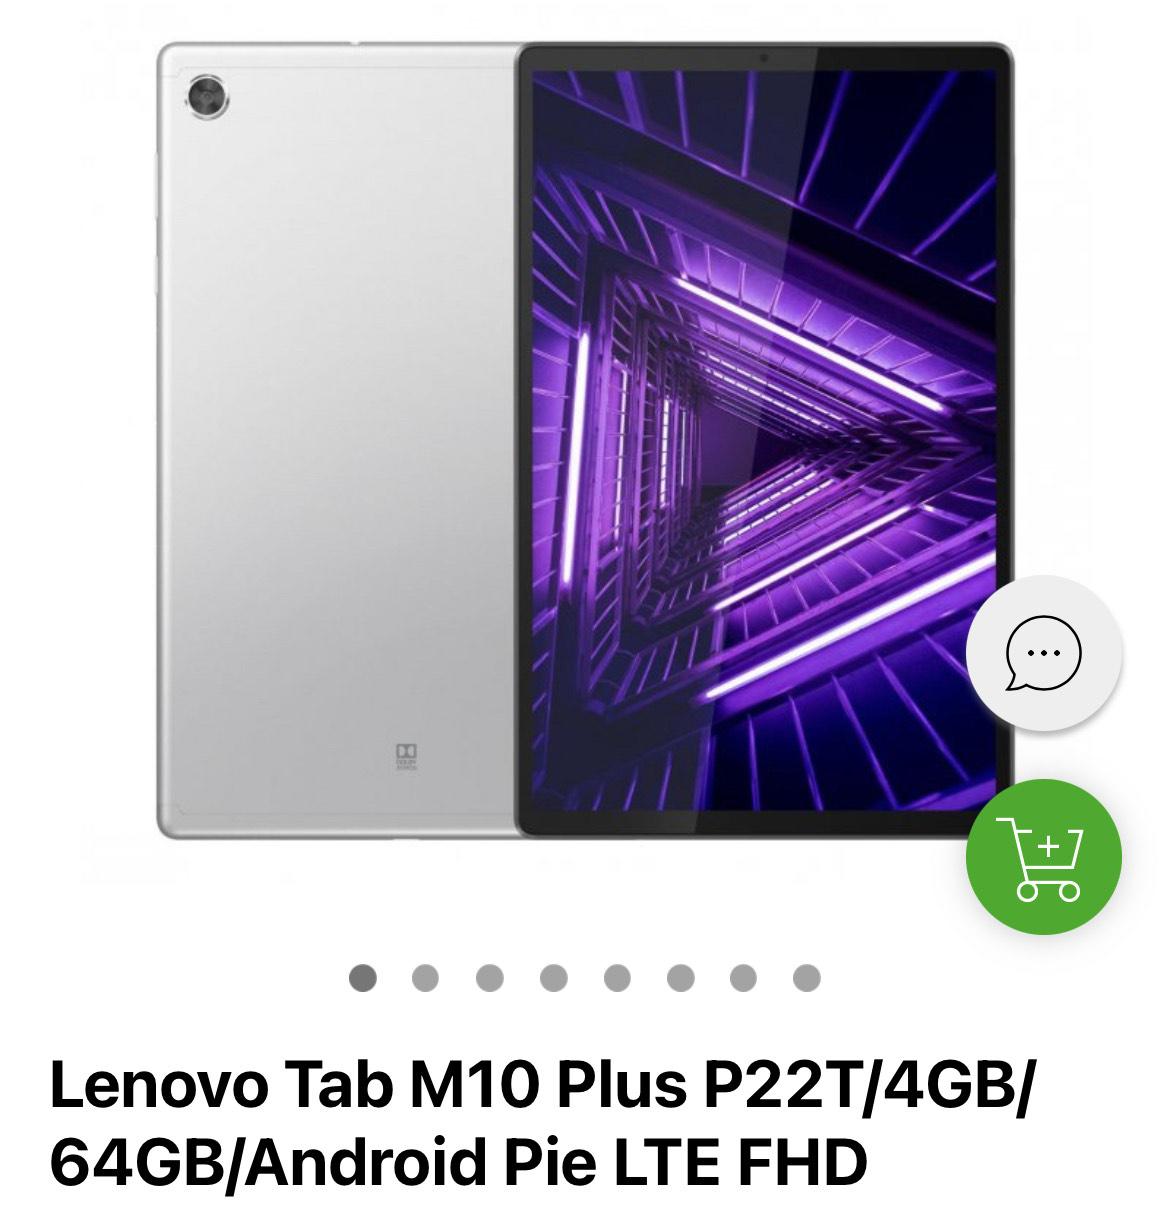 Oferta w aplikacji x-kom: Lenovo Tab M10 Plus P22T/4GB/64GB/Android Pie LTE FHD